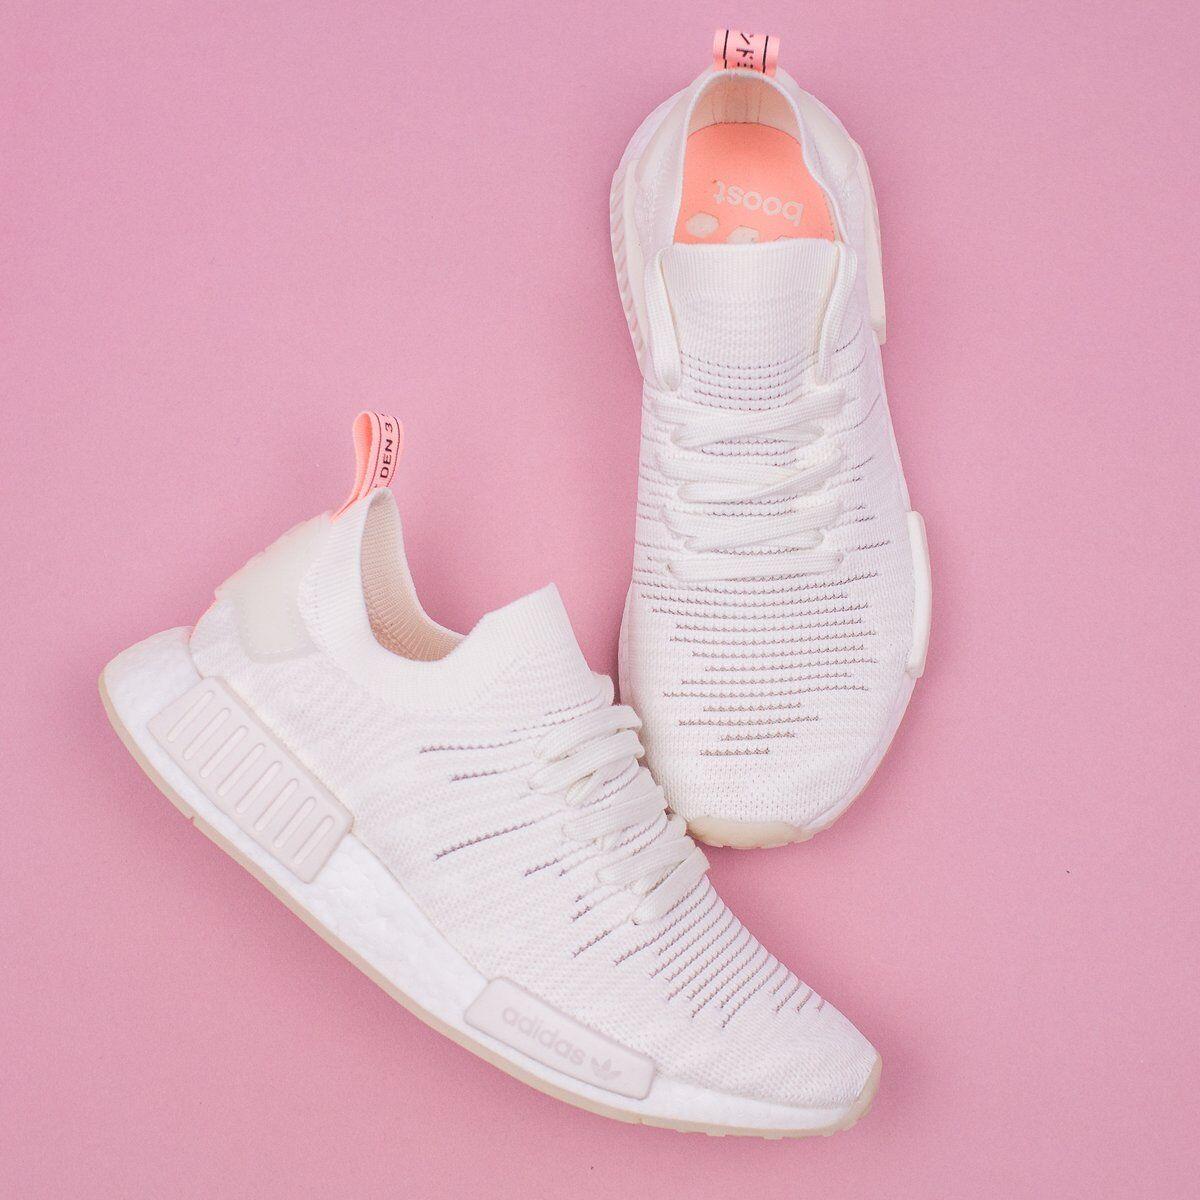 New adidas Originals Wmns Wmns Wmns NMD R1 STLT Primeknit Women Size 9.5 W Sneakers B37655 5265e7